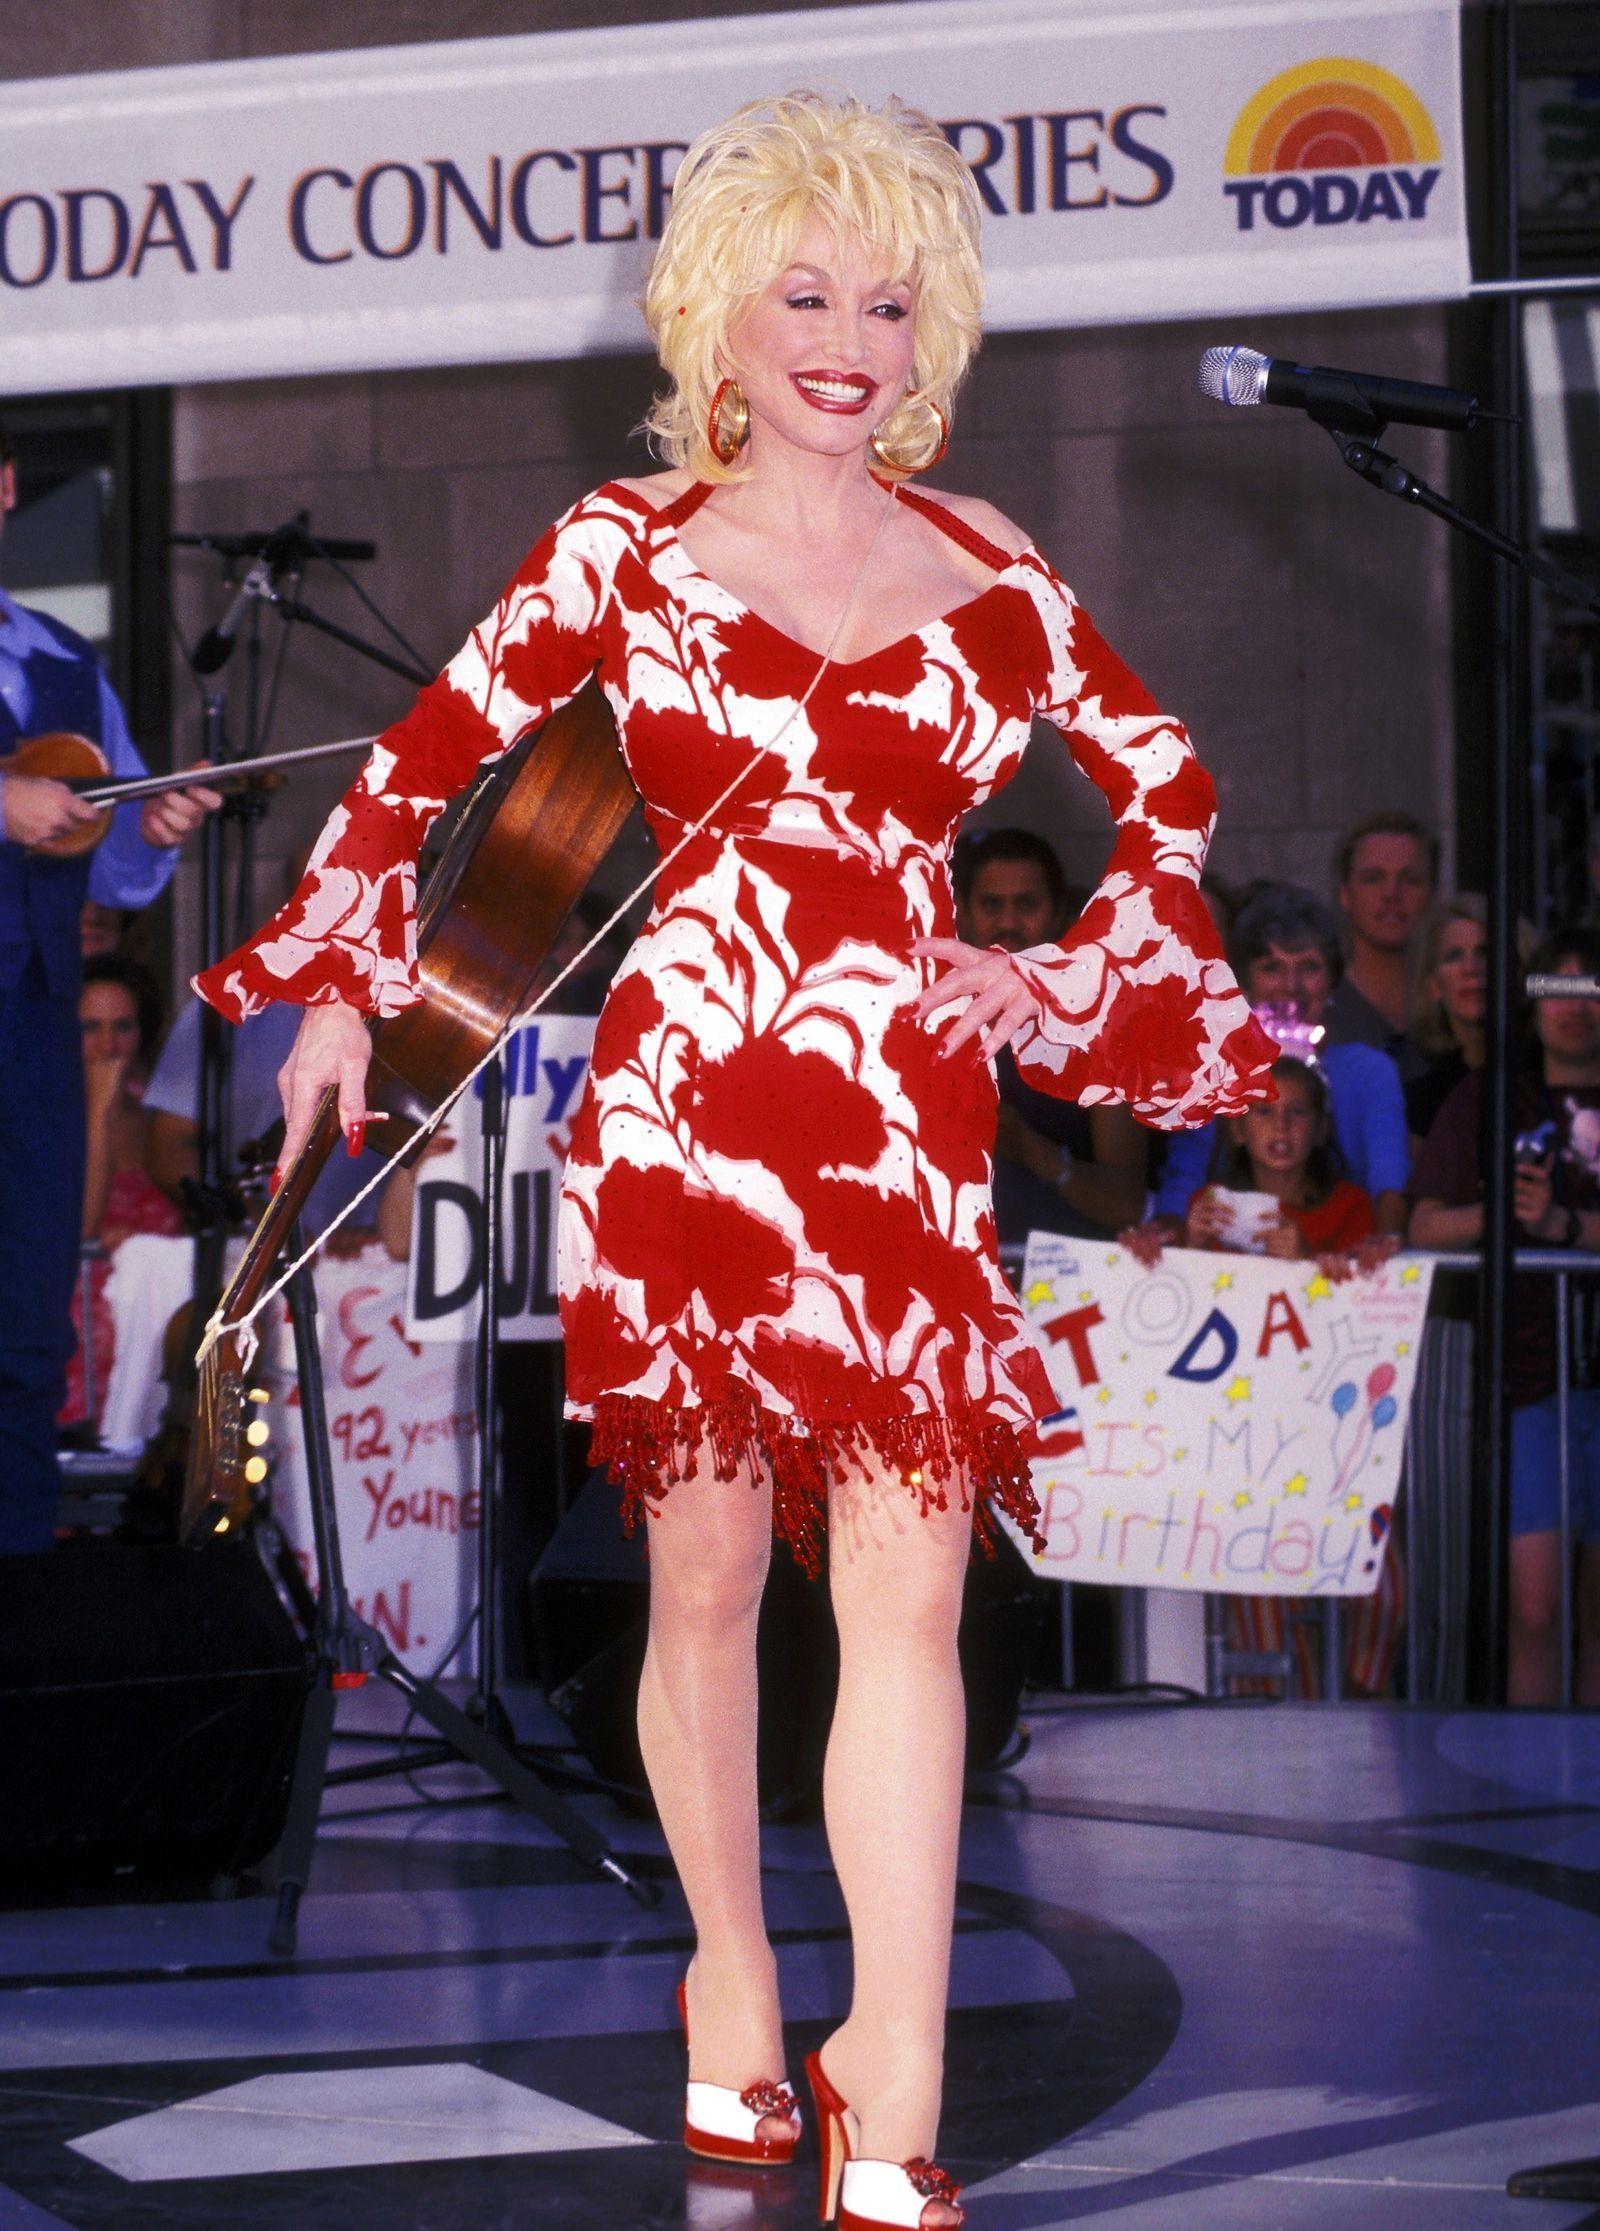 45 Vintage Dolly Parton Photos That Will Make You Want More Sequins in Your Life -  2002 – Cosmopolitan.com  - #asianwomen #badasswomen #dolly #Life #olderwomen #parton #photos #sequins #vintage #womenback #womencrush #womenfrases #womenprofile #womensilhouette #womenstyle #womensuit #wonderwomen